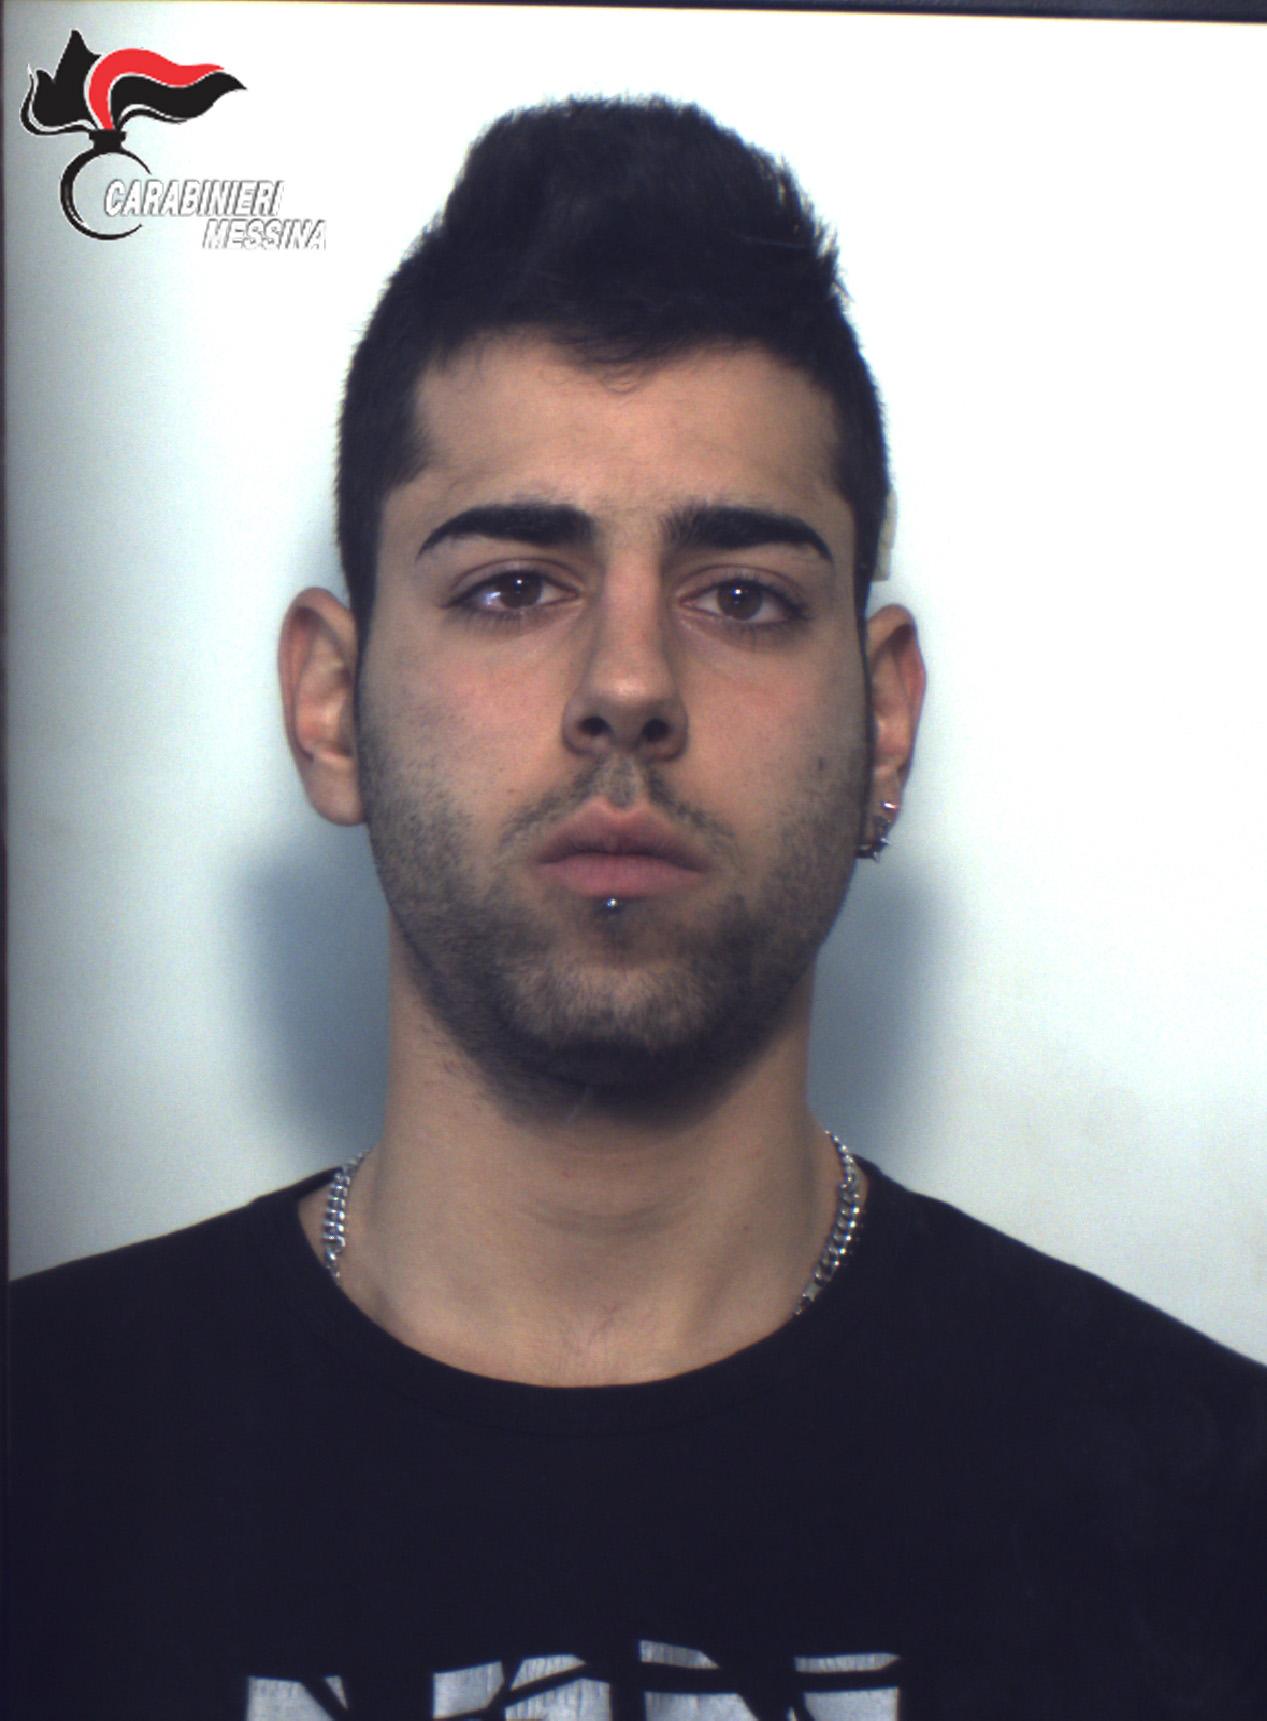 Antonino Di Blasi, 20 anni